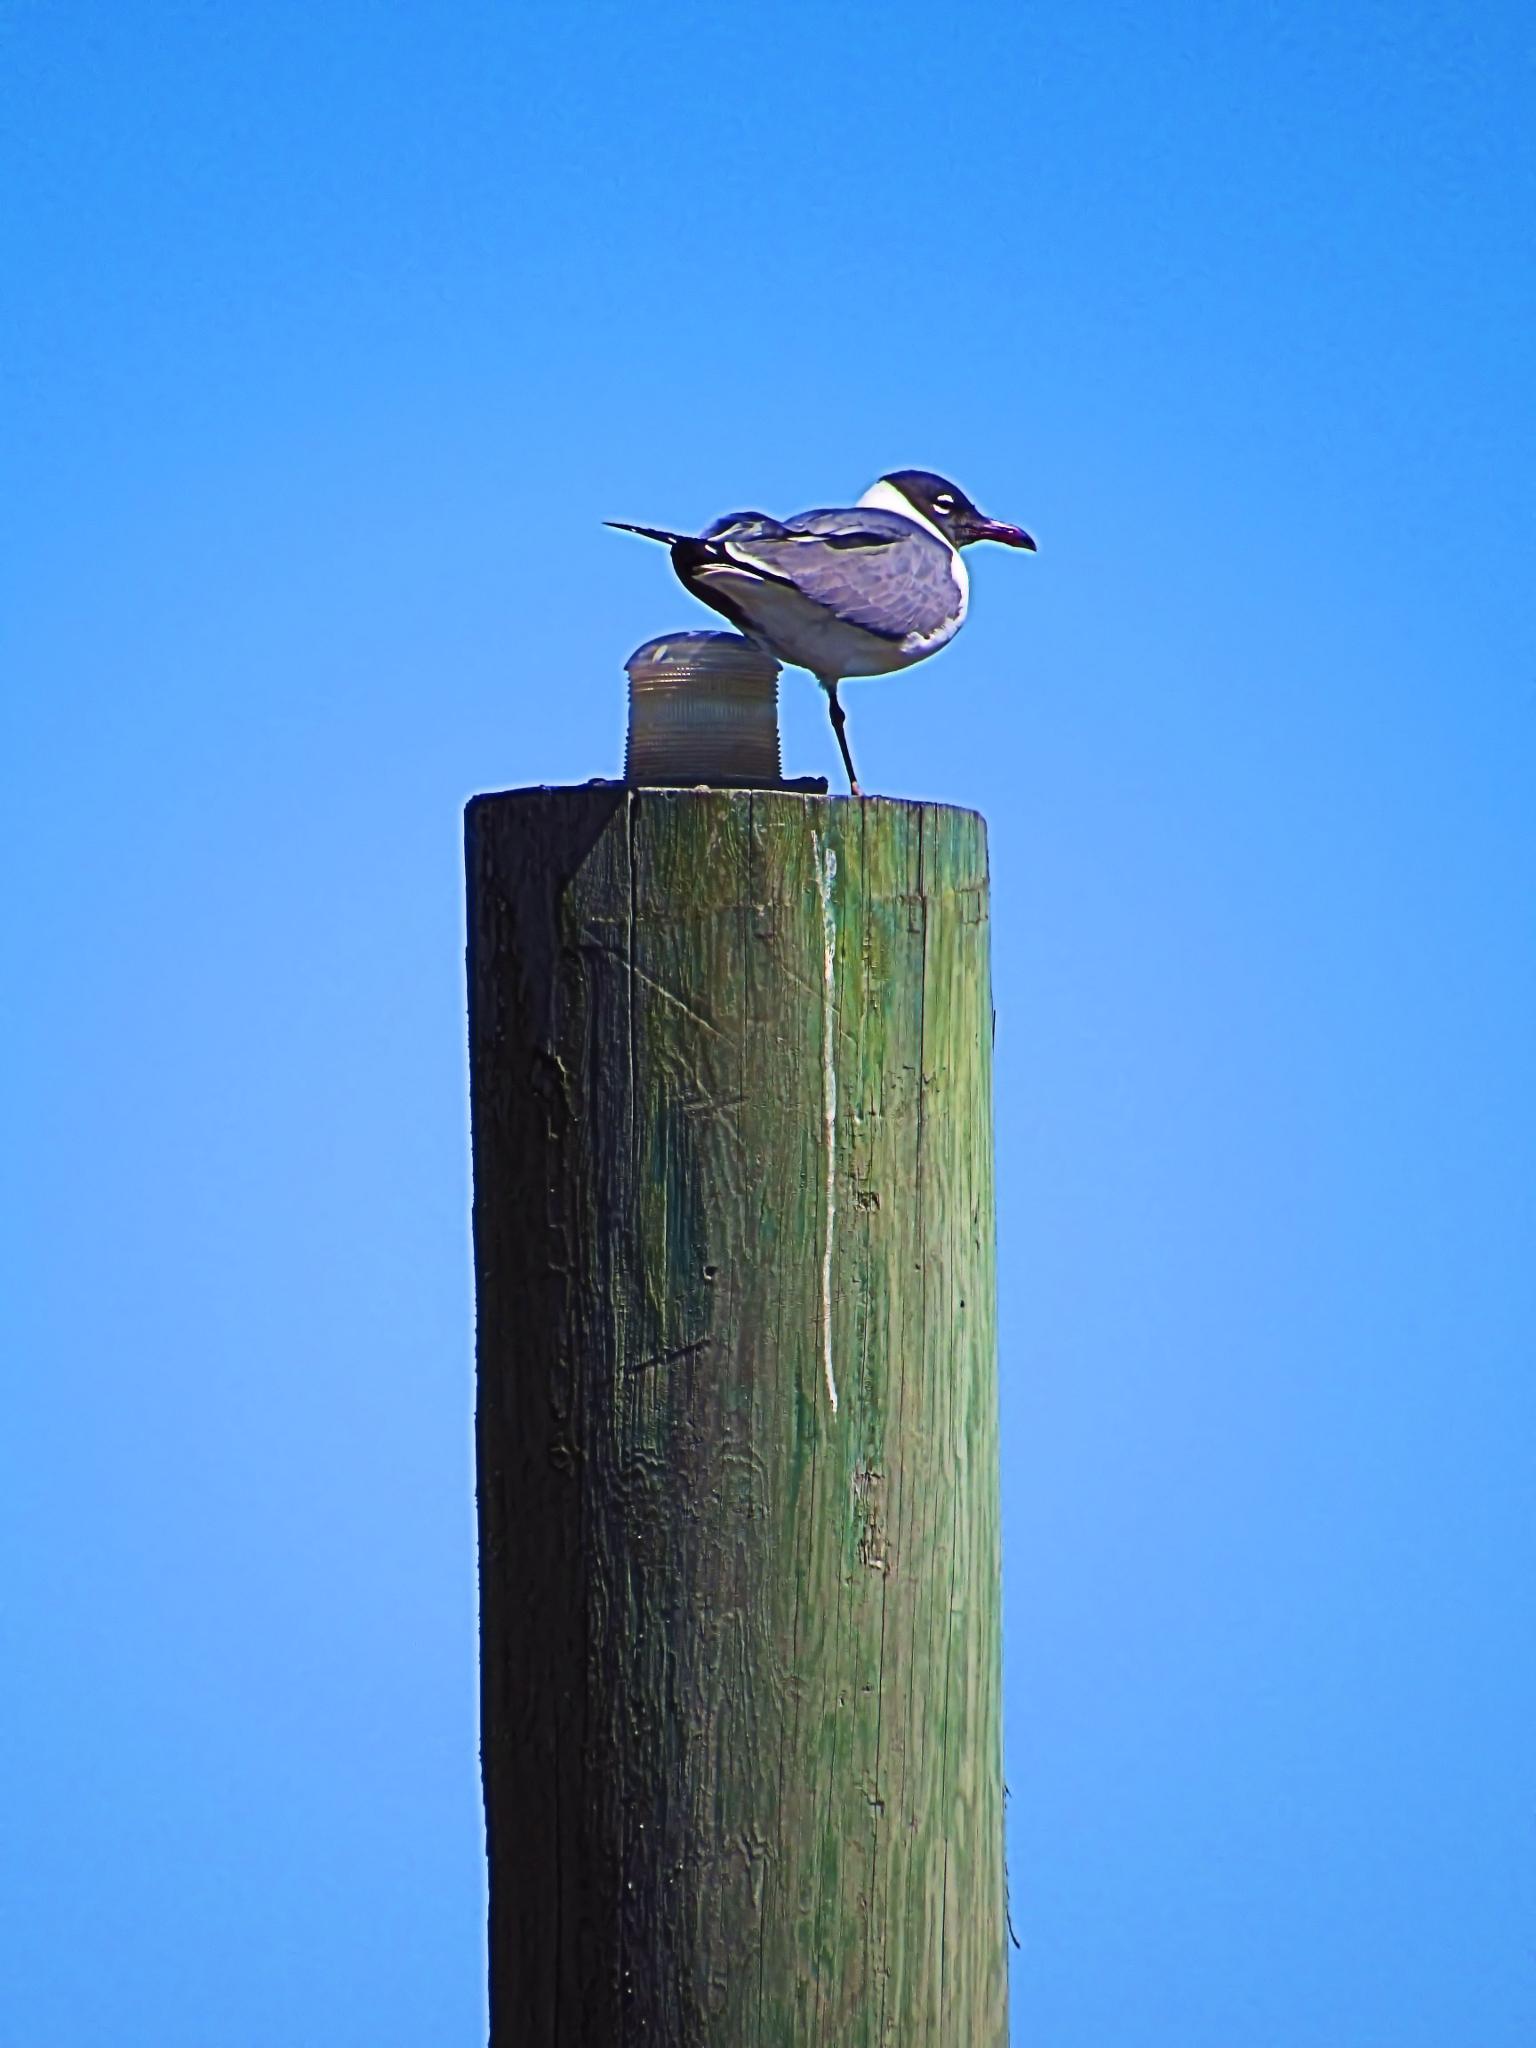 Laughing Gull by irocdavid